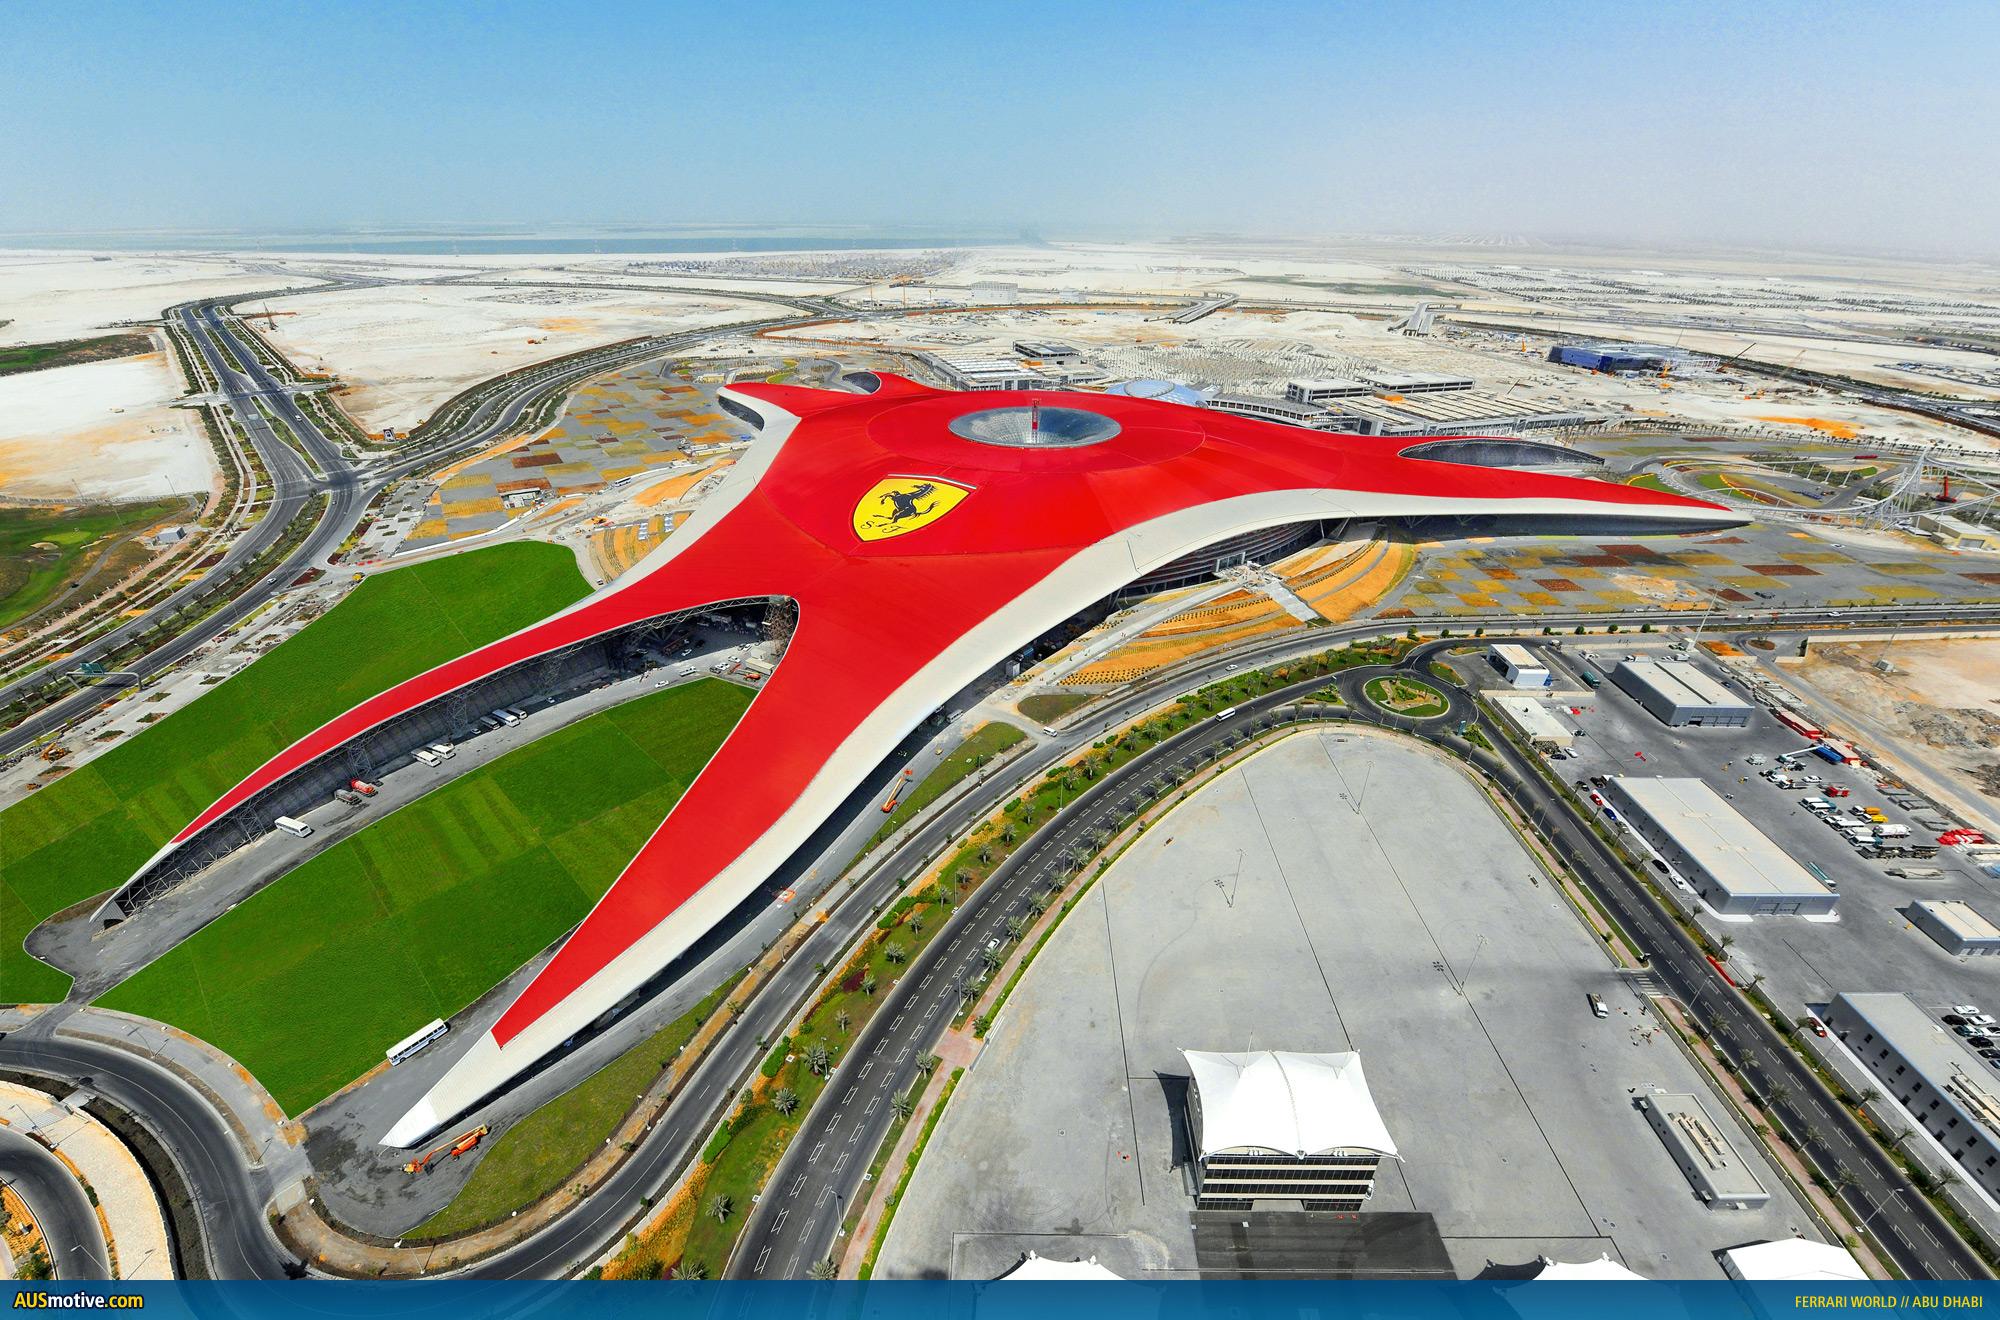 AUSmotive.com » VIDEO: Ferrari World sales pitch